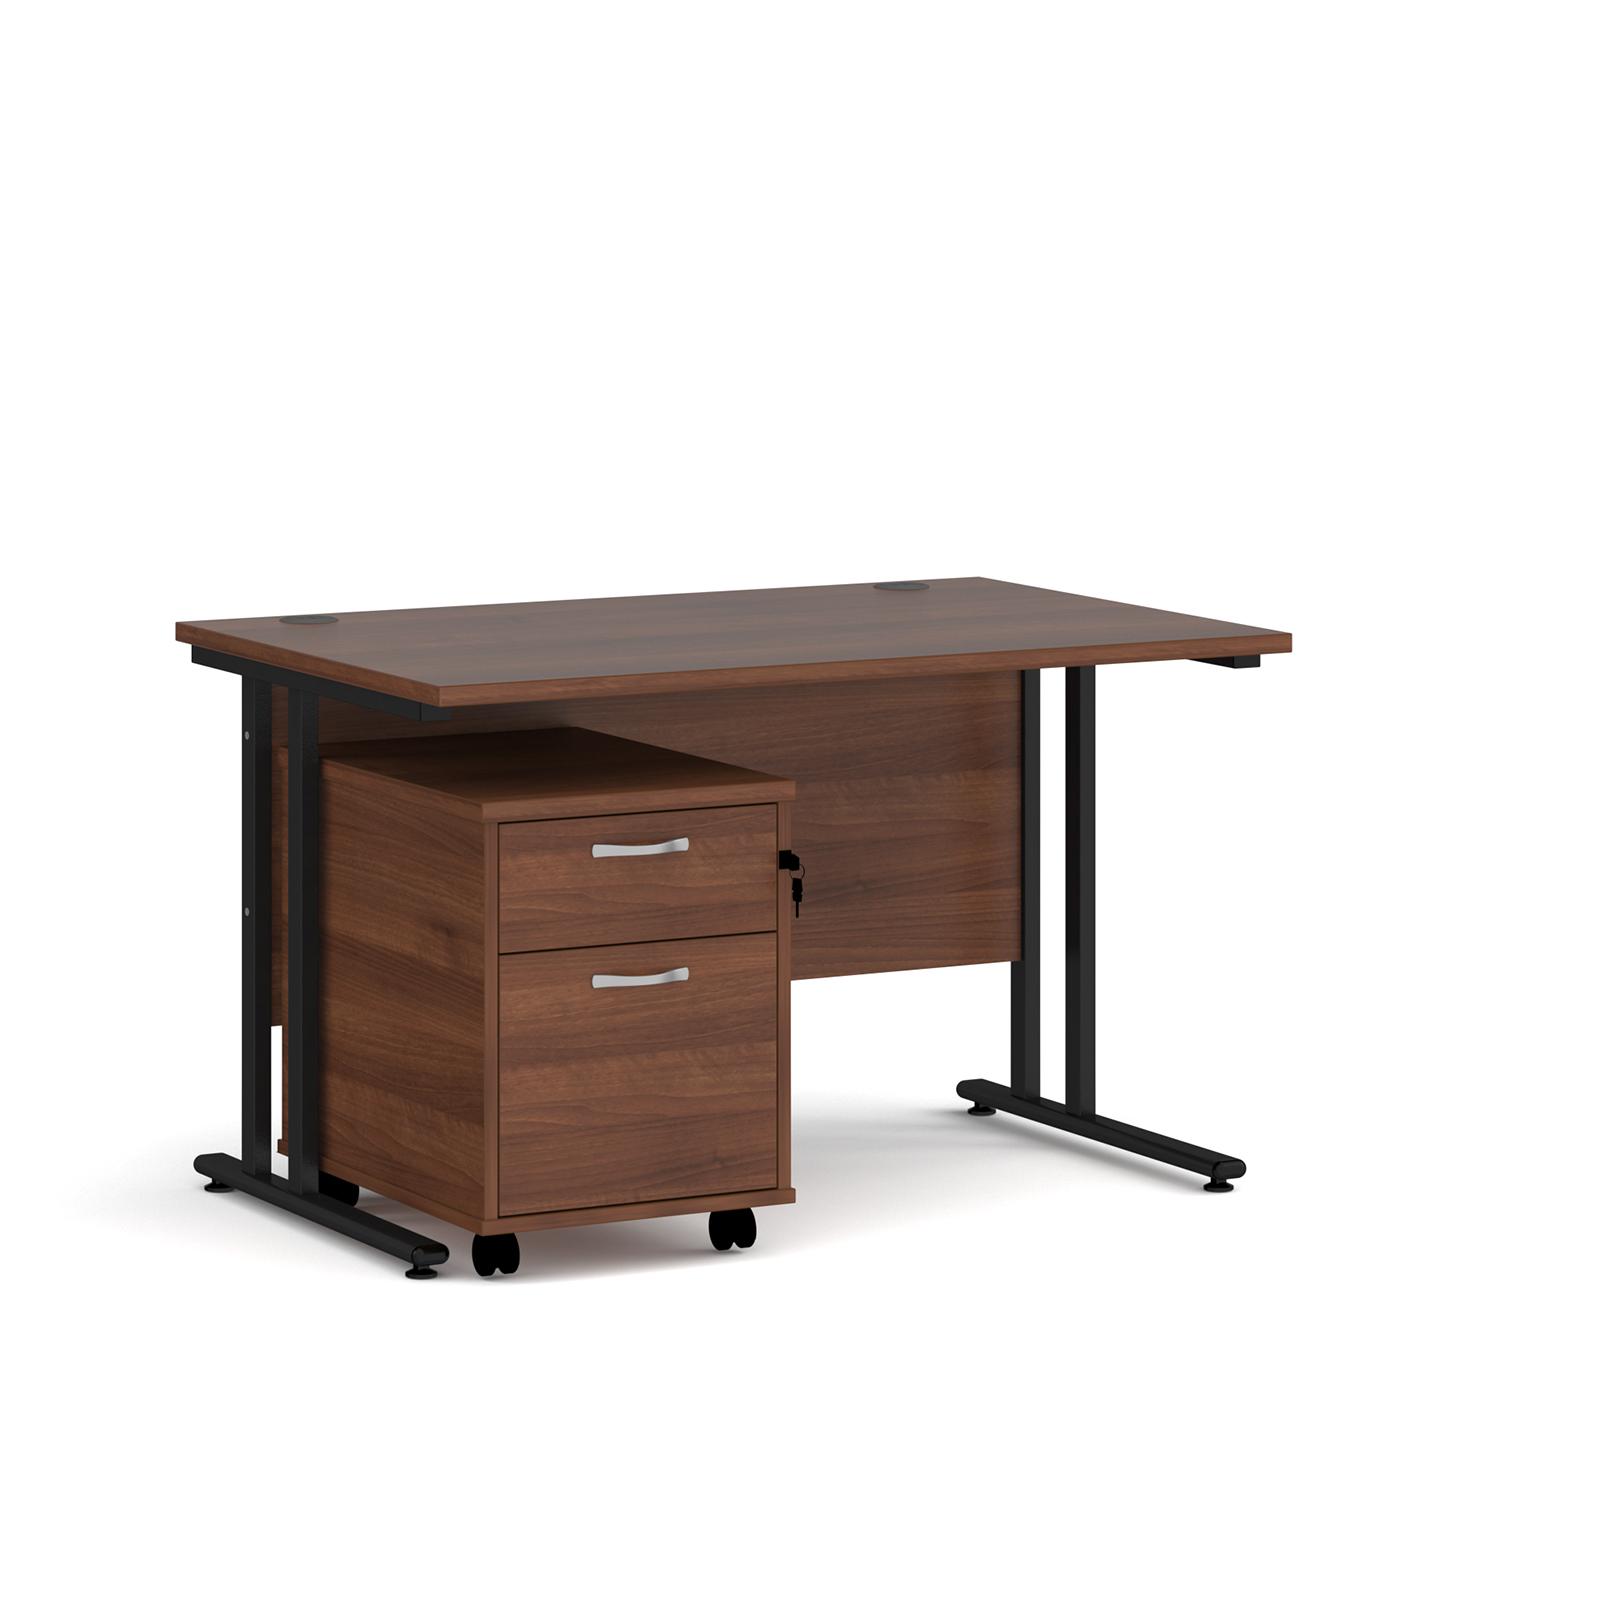 Rectangular Desks Maestro 25 straight desk 1200mm x 800mm with black cantilever frame and 2 drawer pedestal - walnut